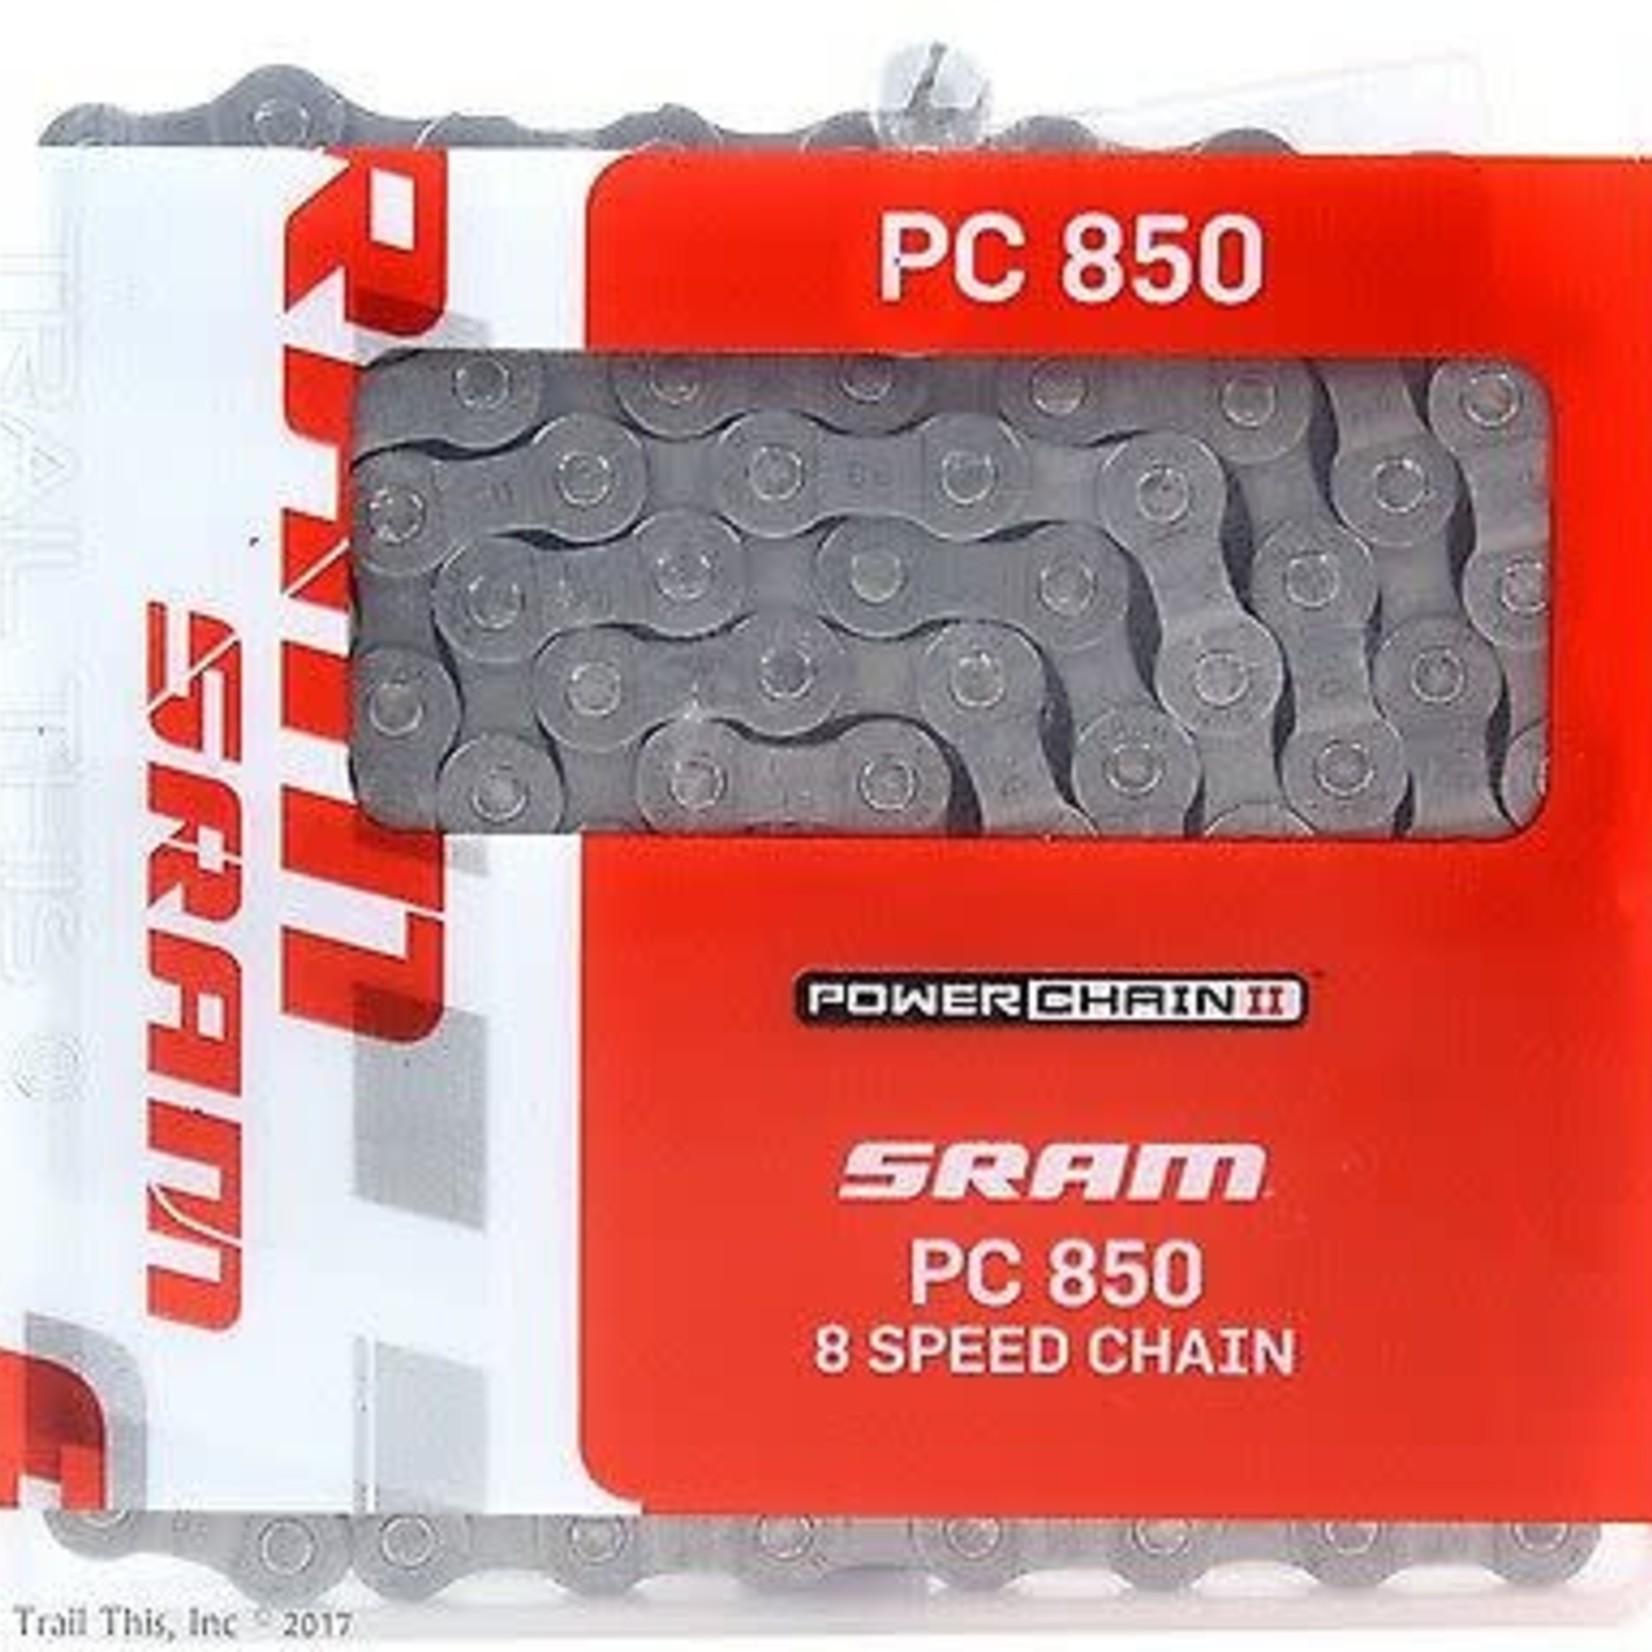 sram SRAM PC-850 Chain - 6, 7, 8-Speed, 114 Links, Silver